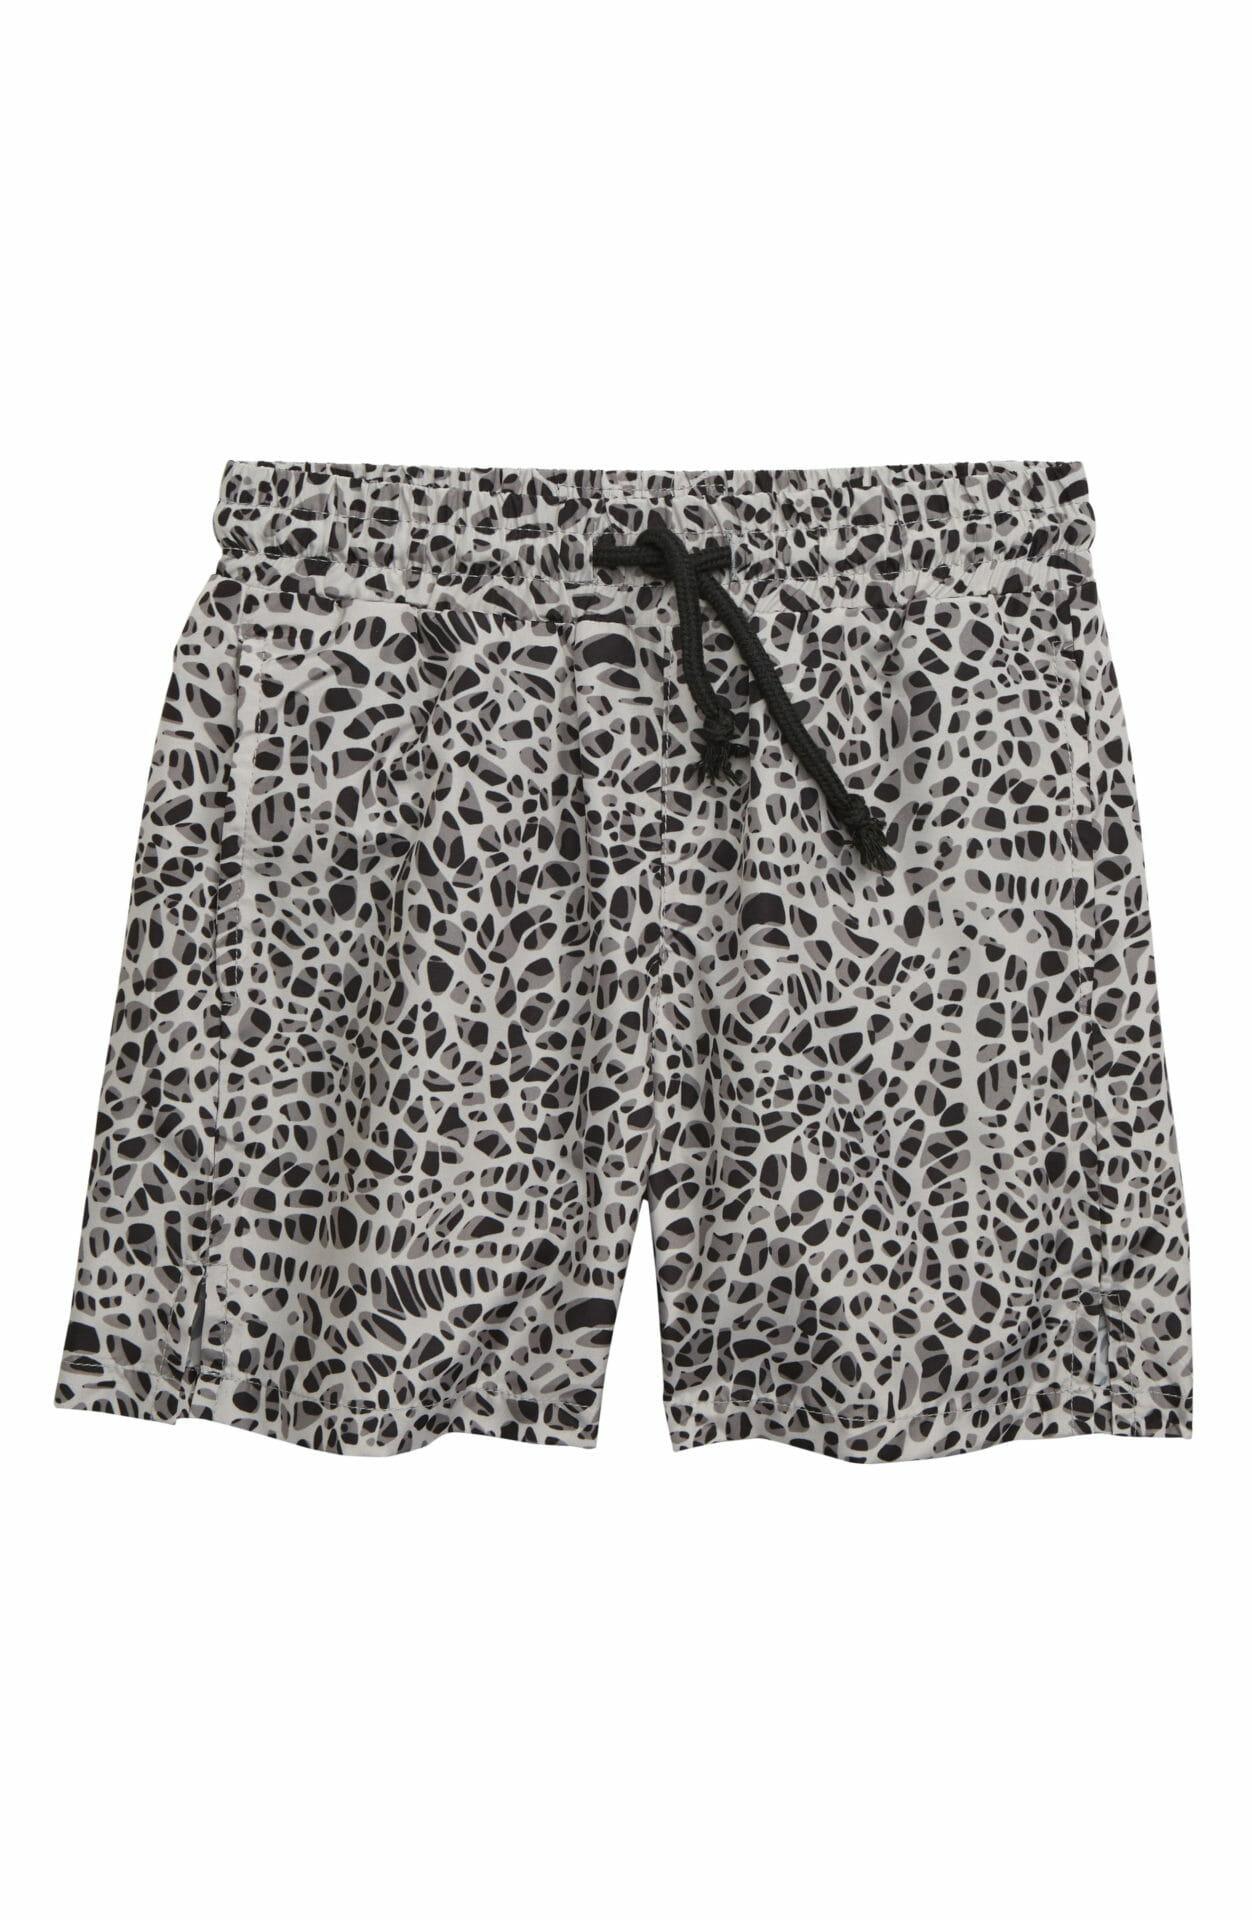 SOMETIME SOON Splash Swim Trunks, Main, color, WHITE/ BLACK